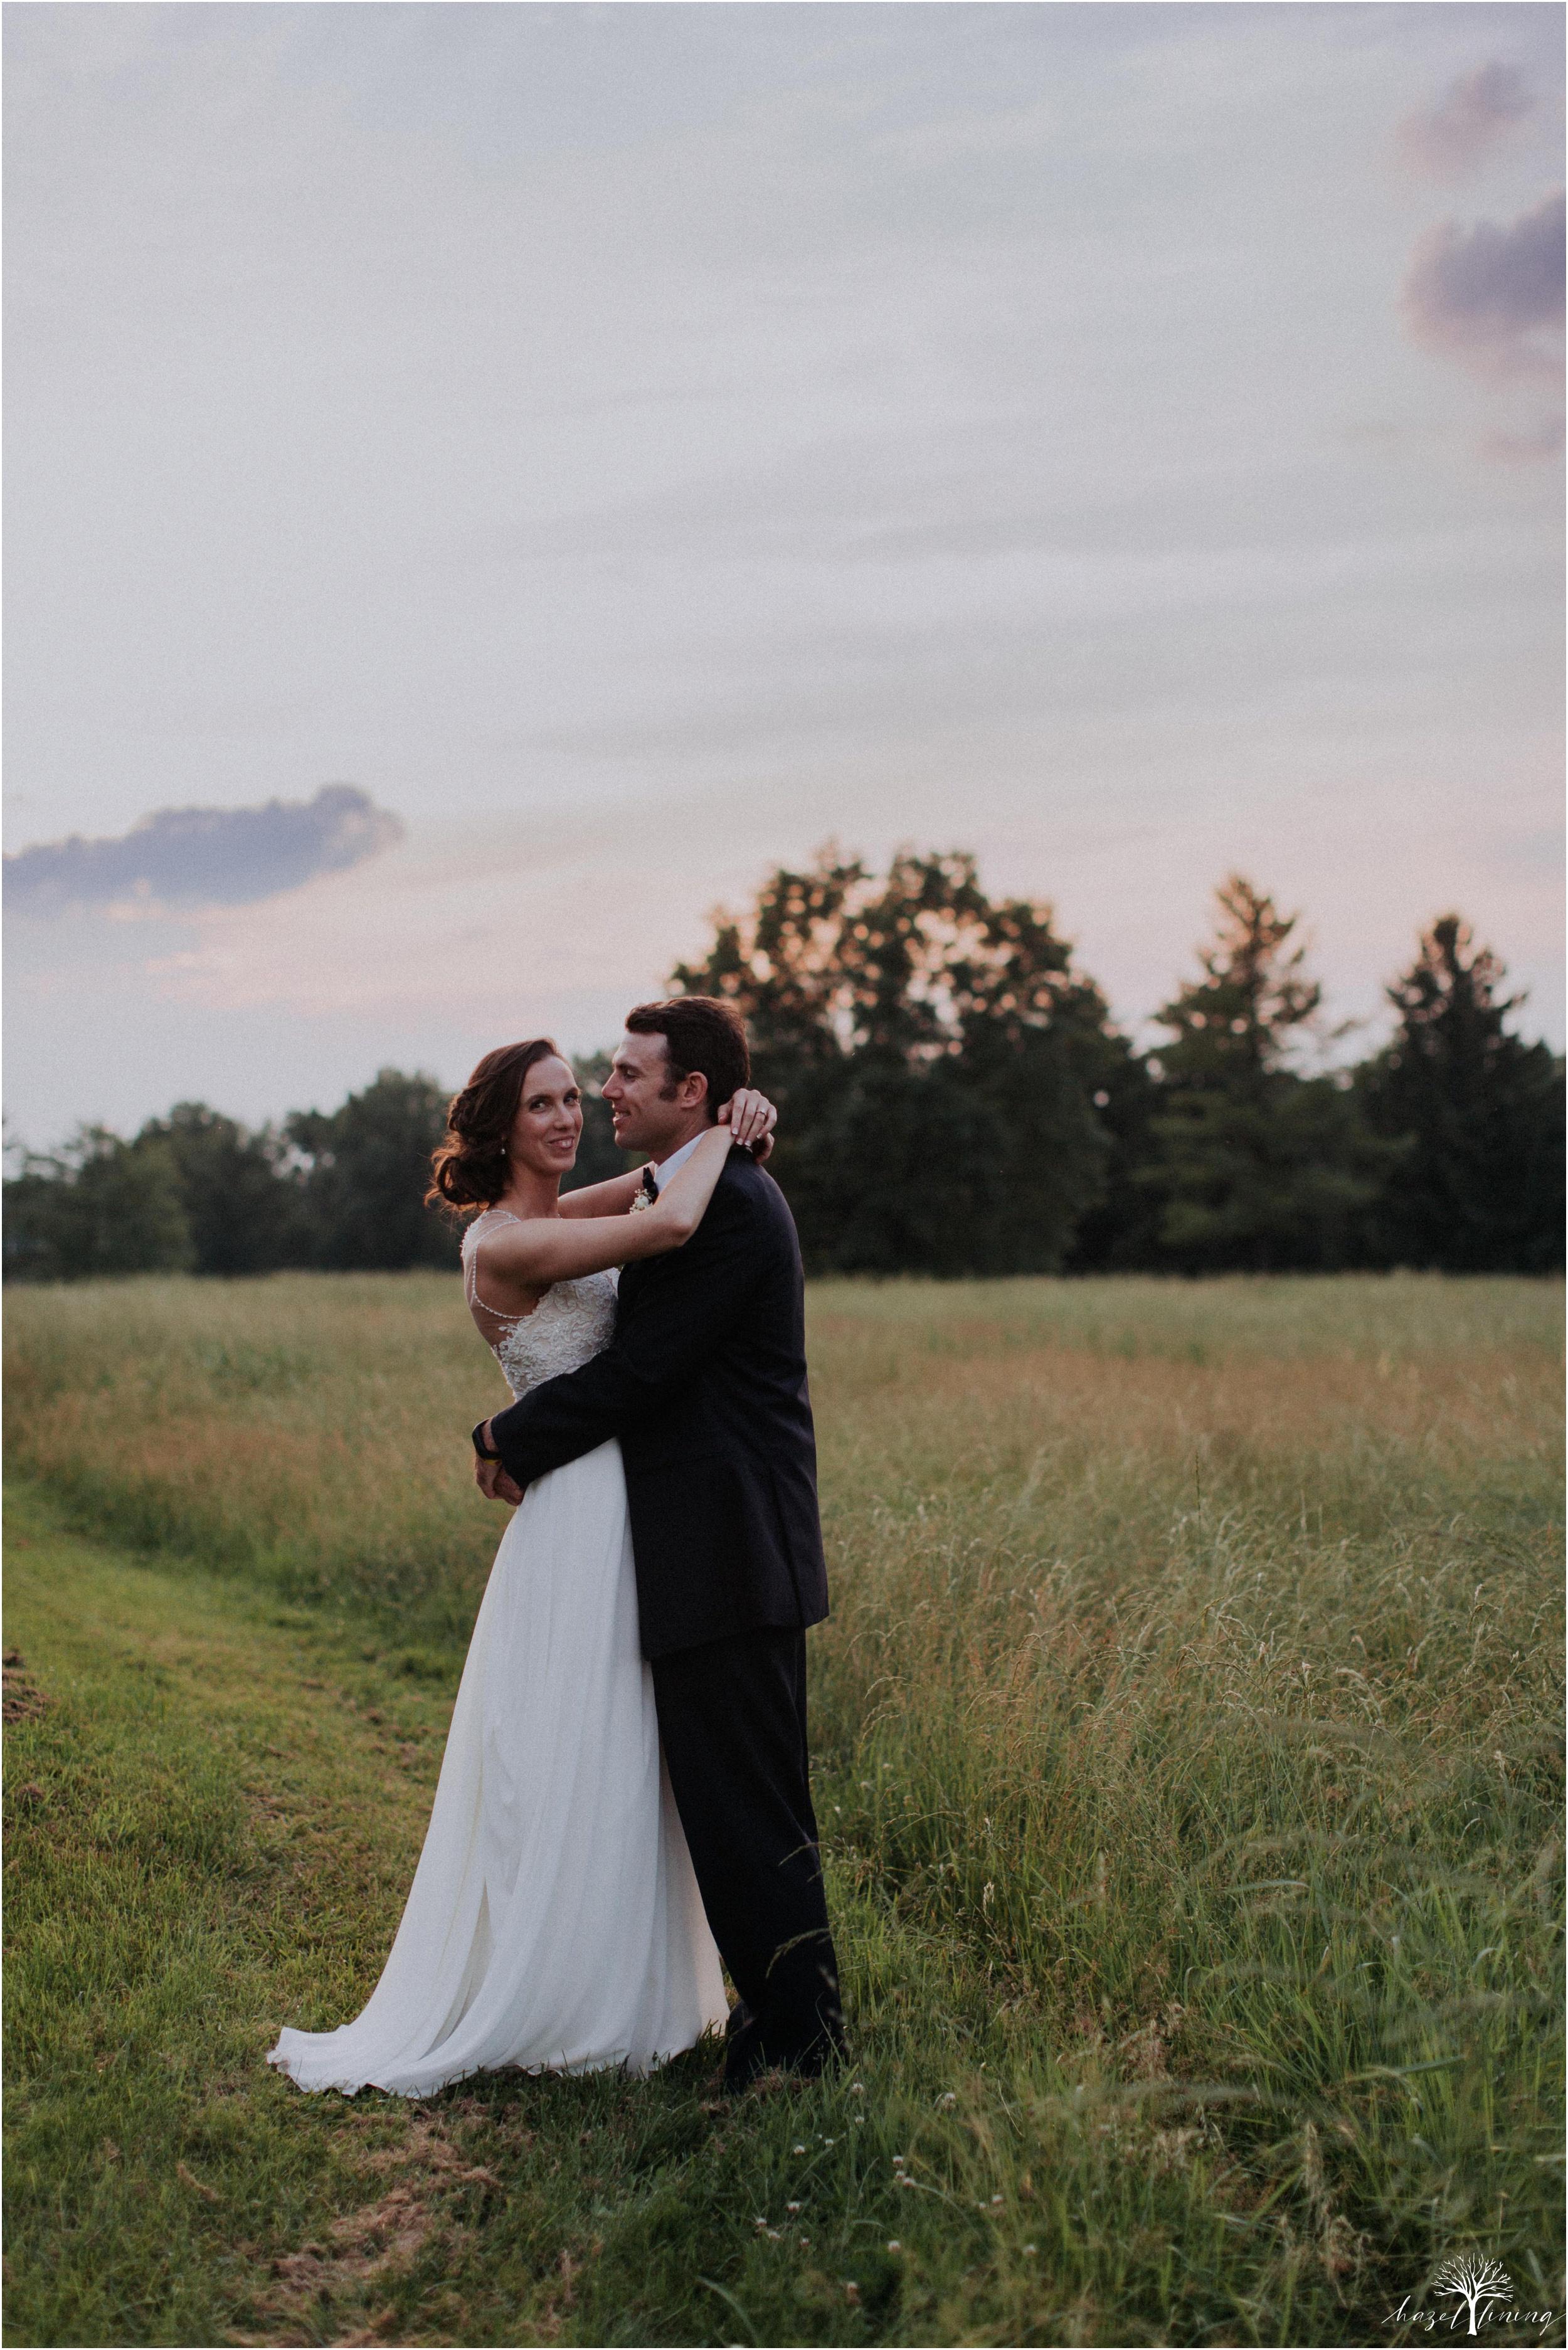 hazel-lining-travel-wedding-elopement-photography_0178.jpg